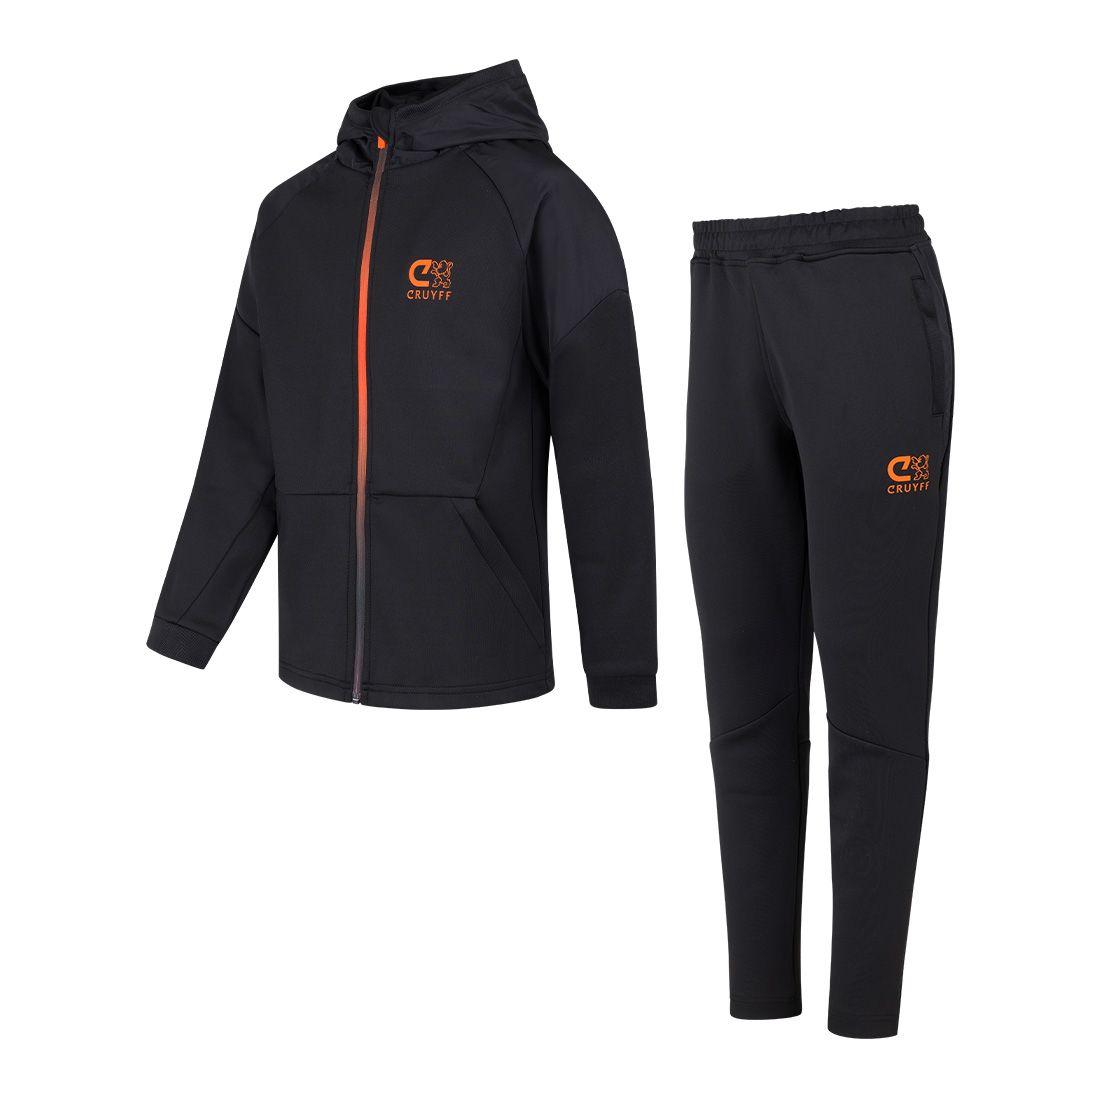 Cruyff Pointer Trainingspak Kids Zwart Oranje